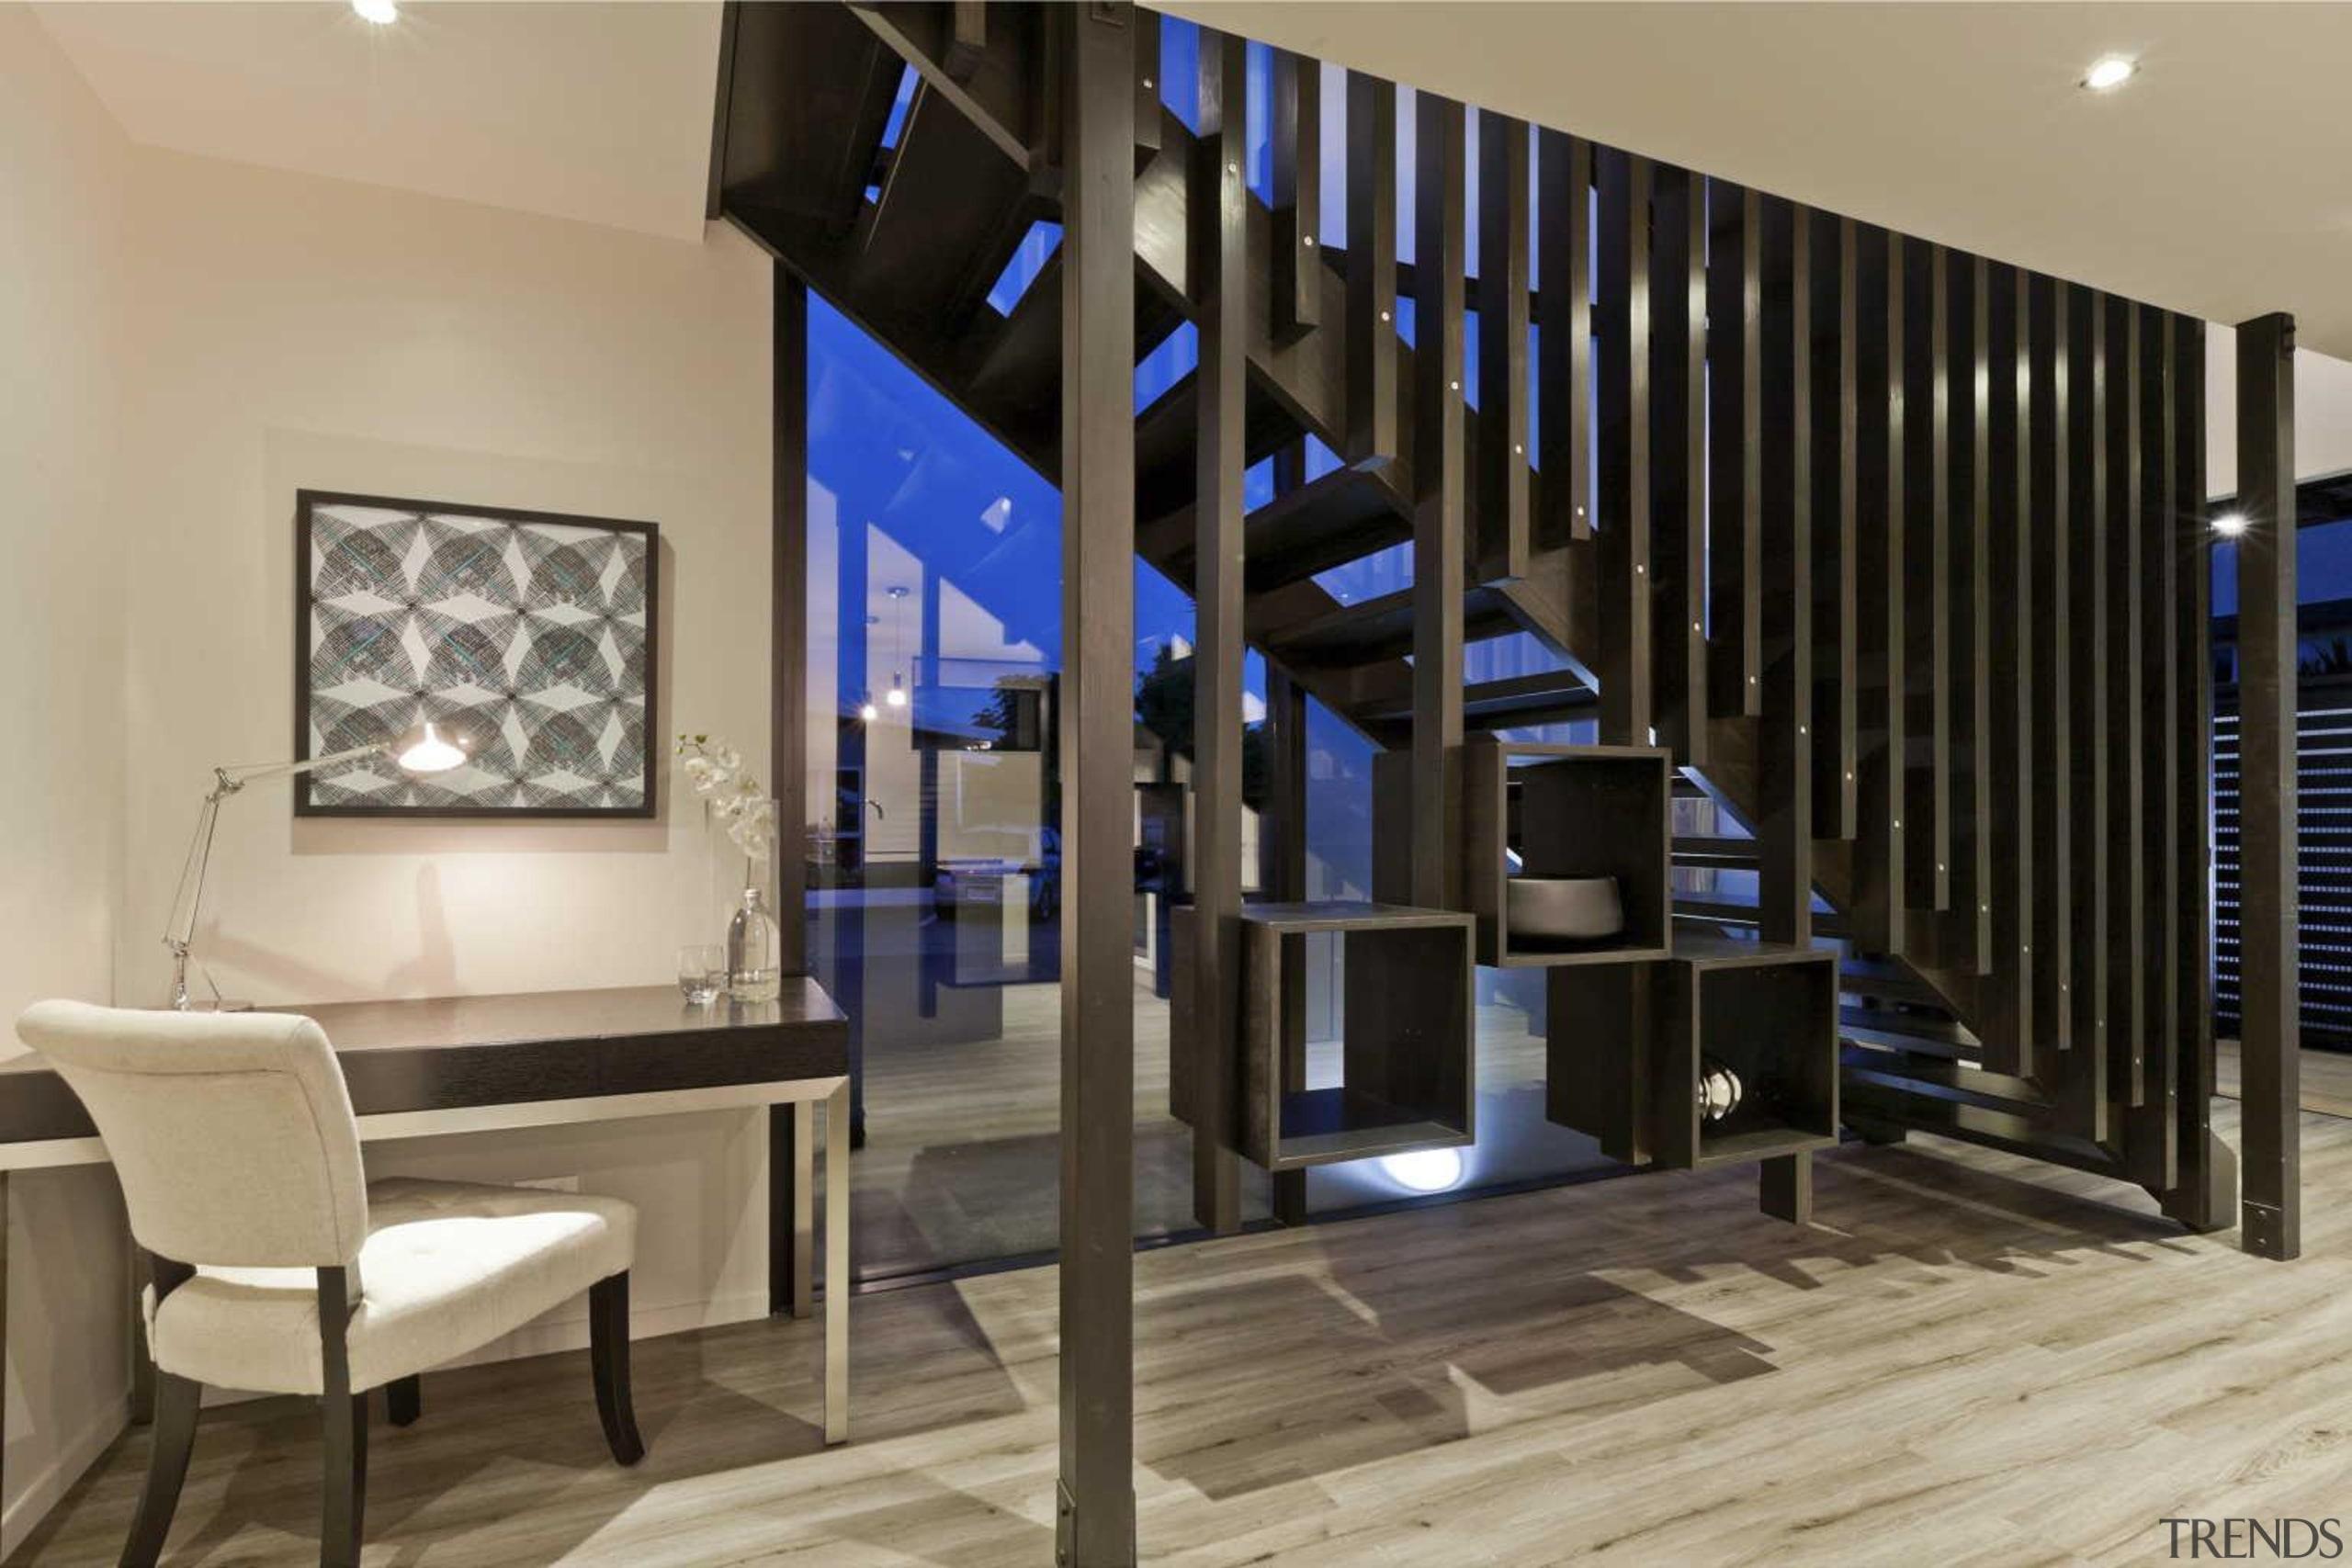 Staircase design by Yellowfox - Staircase - floor floor, flooring, interior design, lobby, stairs, black, orange